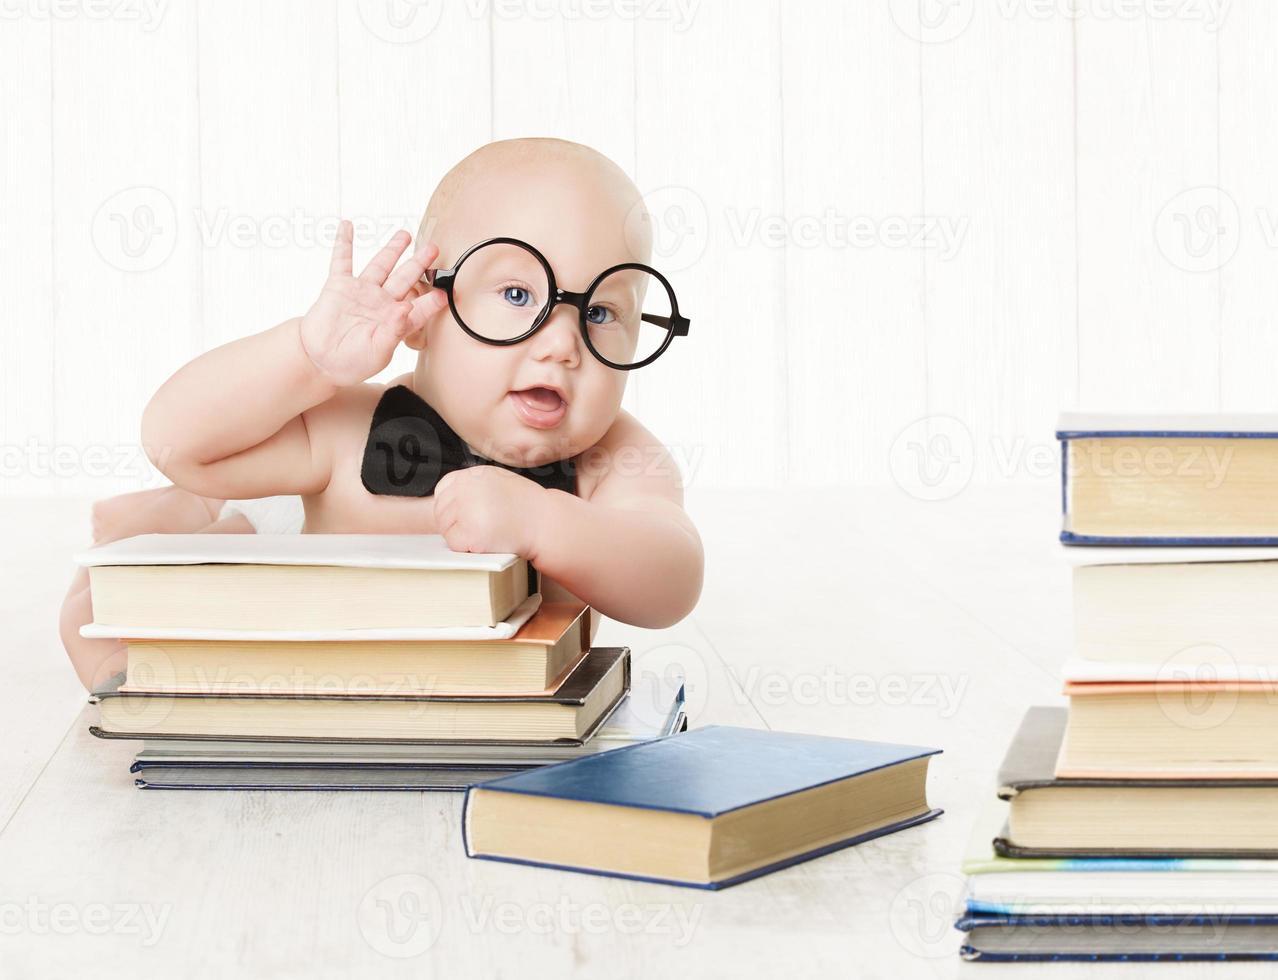 Baby Glasses Books, Preschool Kid, Early Childhood Education and Development photo